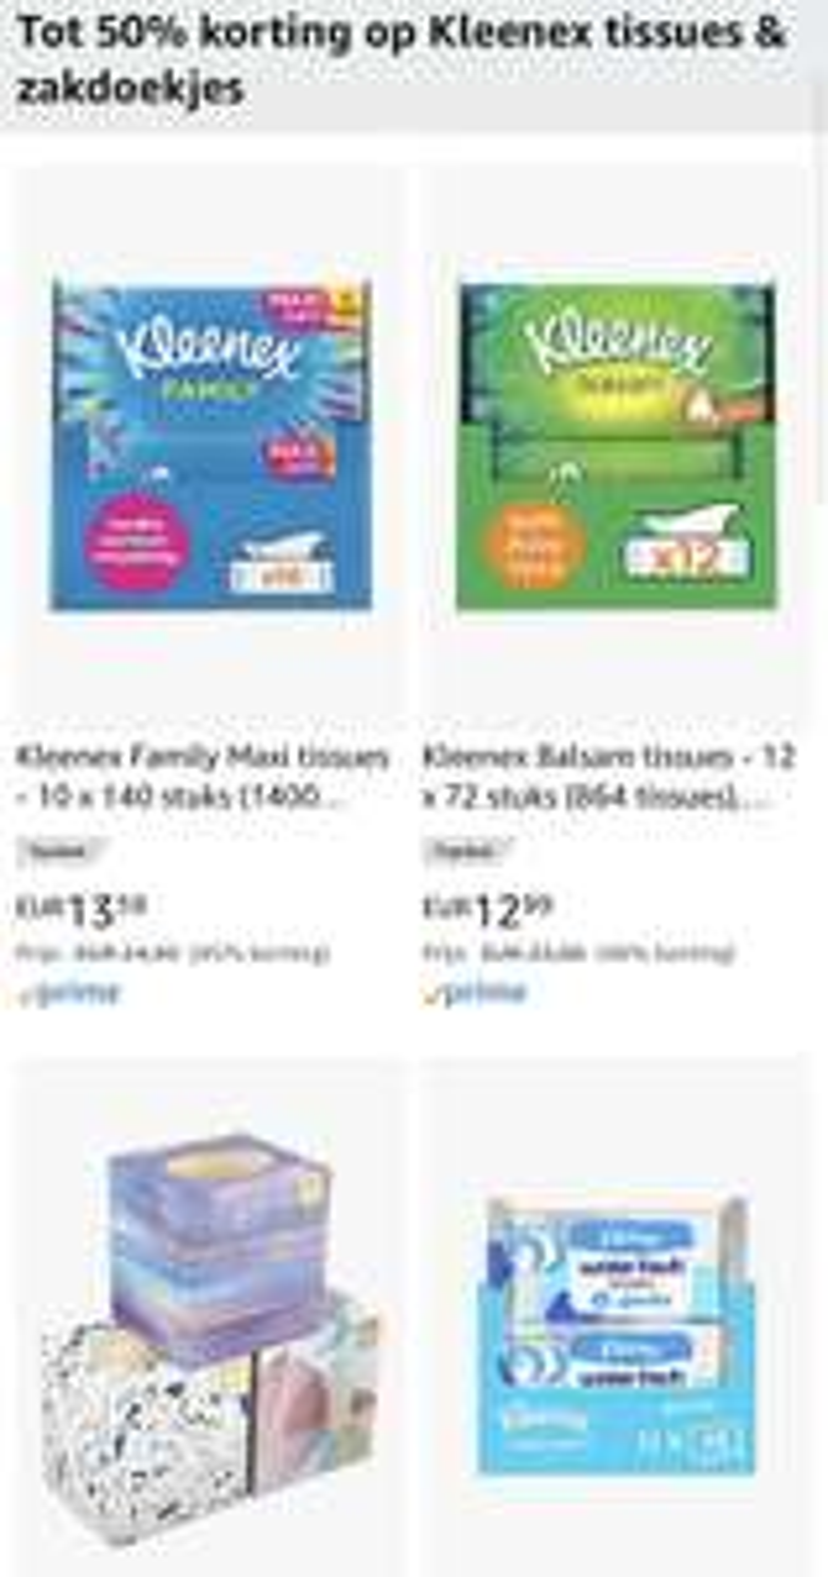 Tot 50% korting op Kleenex tissues & zakdoekjes